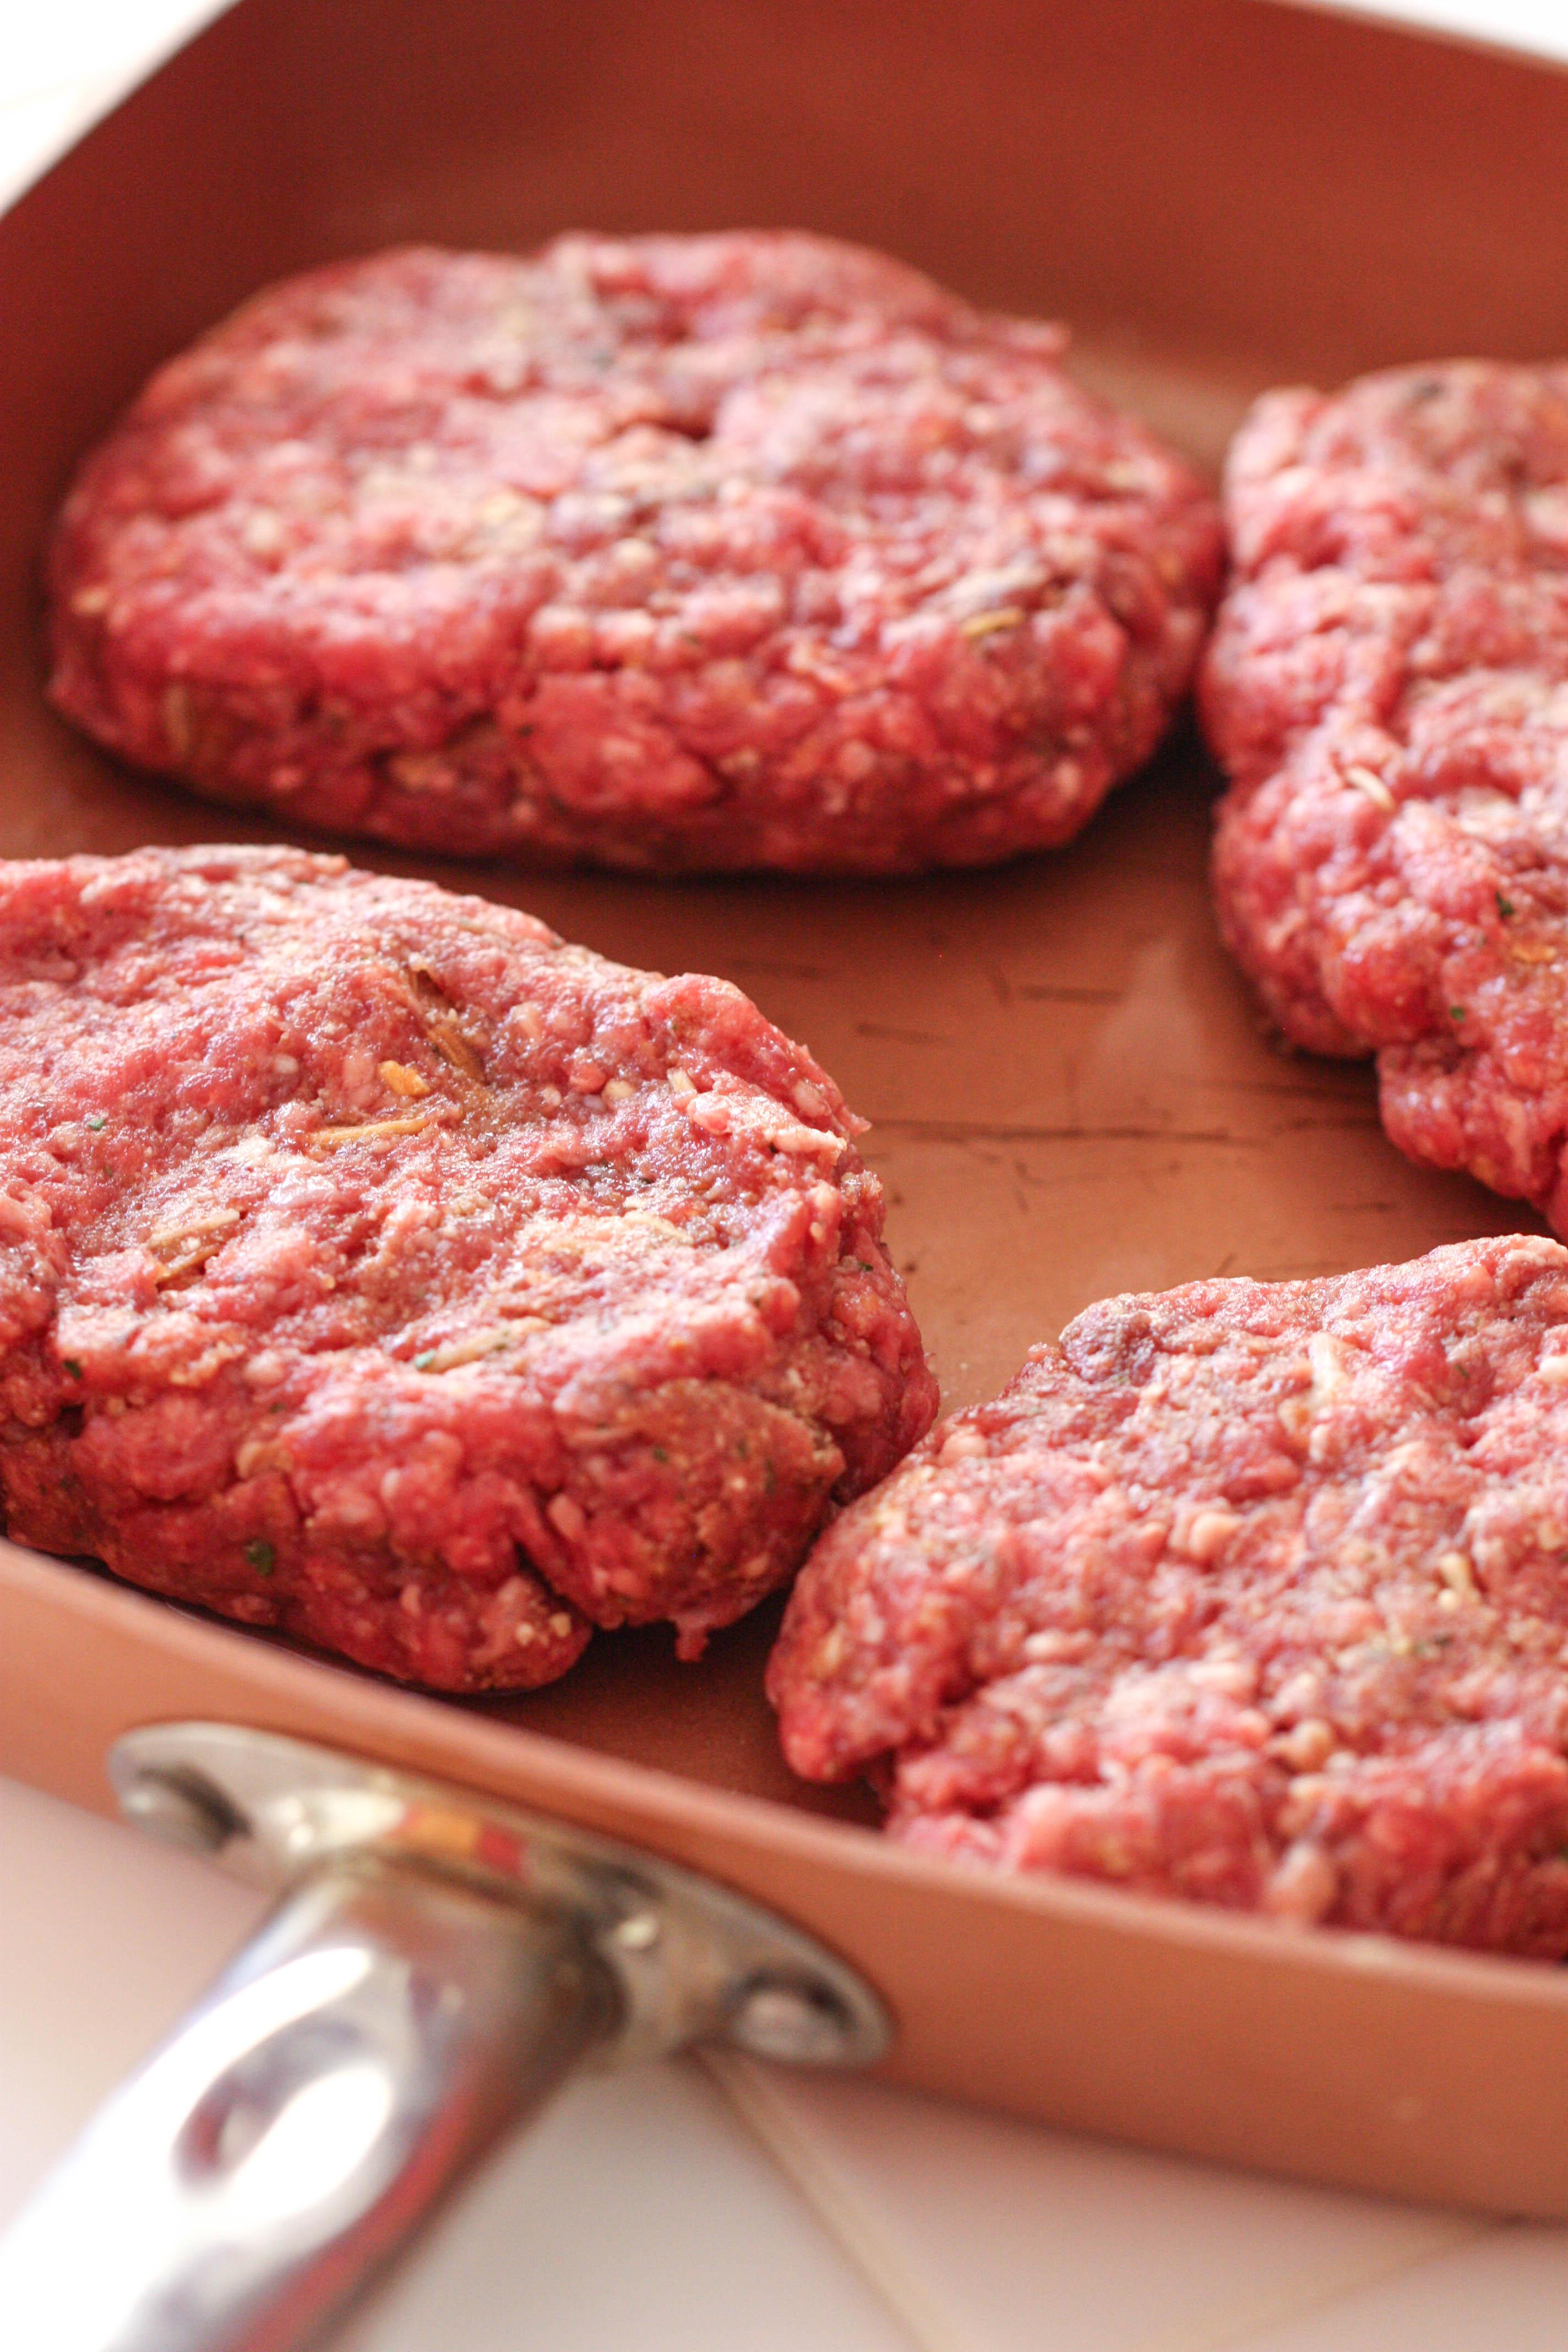 Homemade Salisbury Steak patties ready to cook